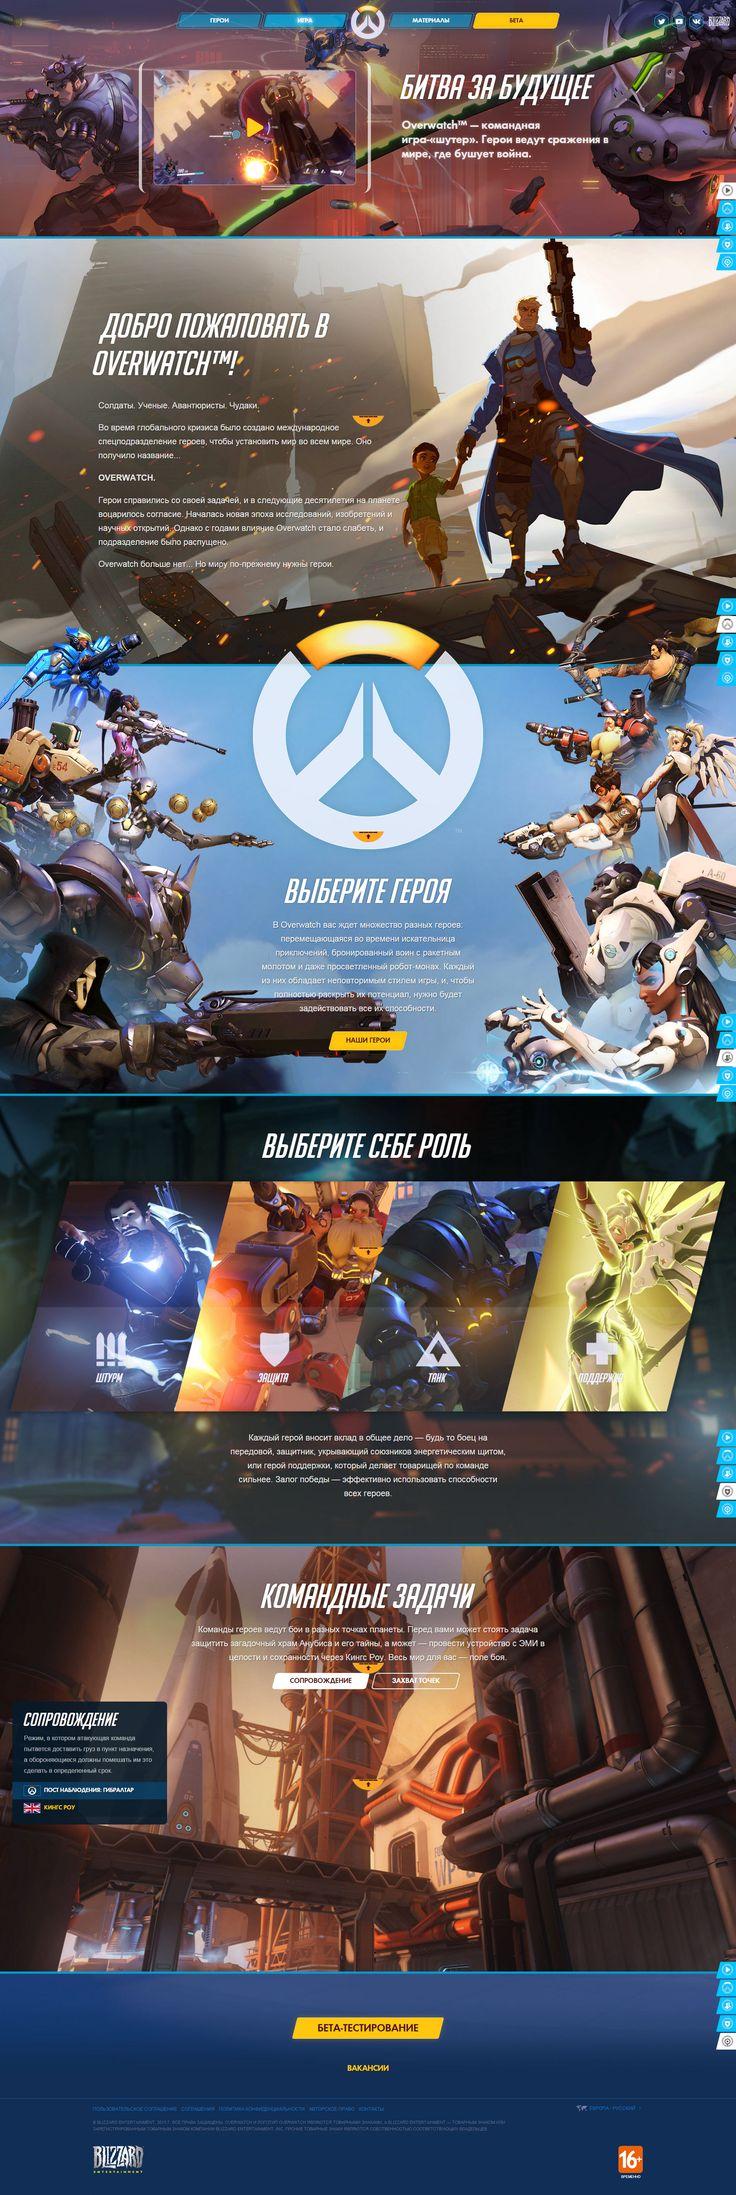 Лендинг Overwatch http://eu.battle.net/overwatch/ru/game/